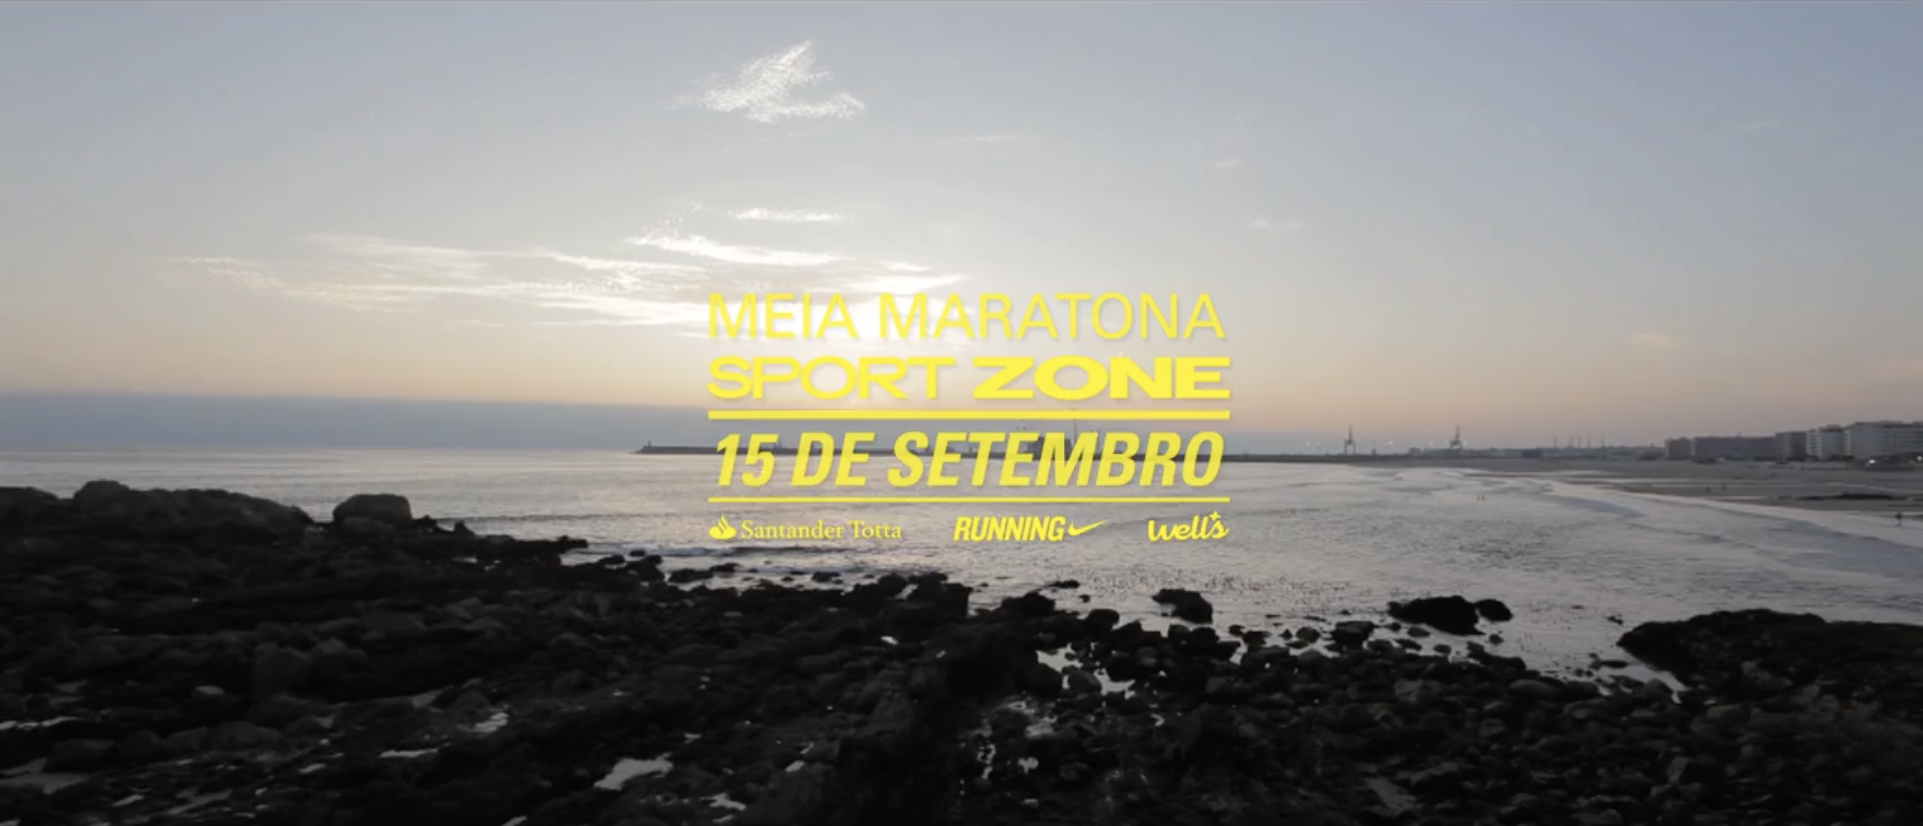 MEIA MARATONA SPORT ZONE  2013